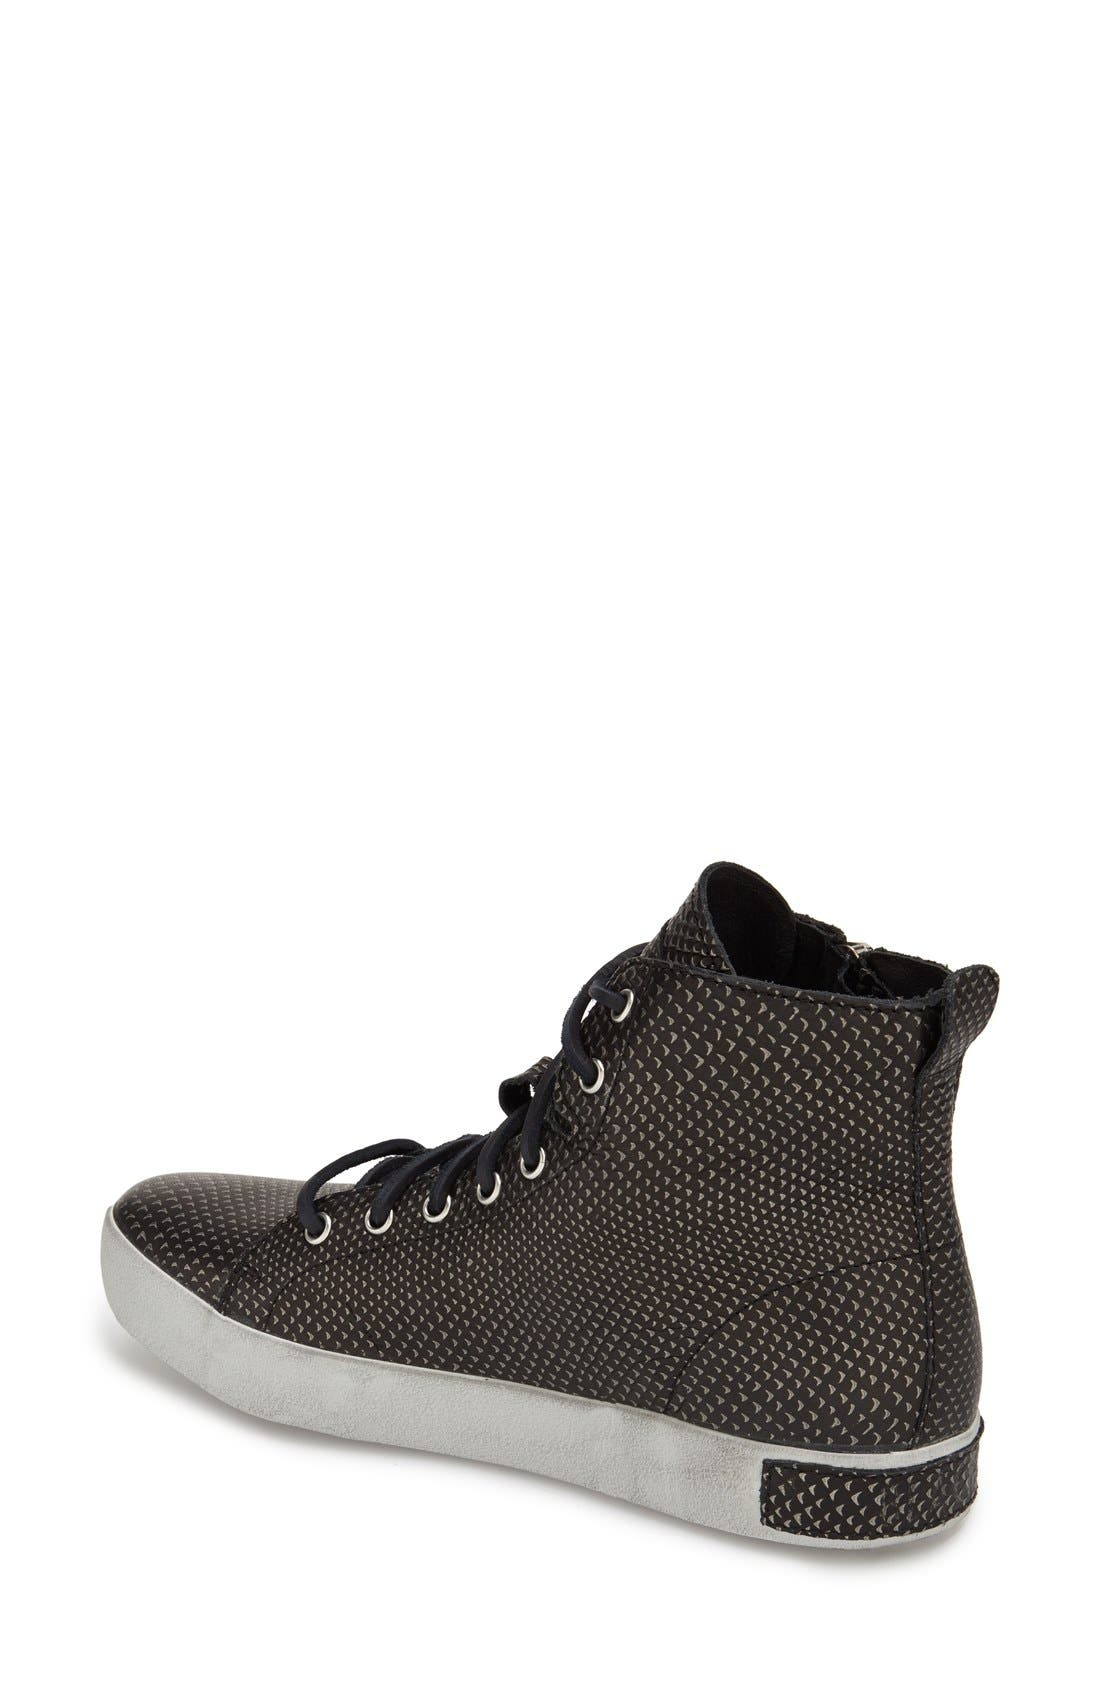 Alternate Image 2  - Blackstone 'KL57' High Top Sneaker (Women)